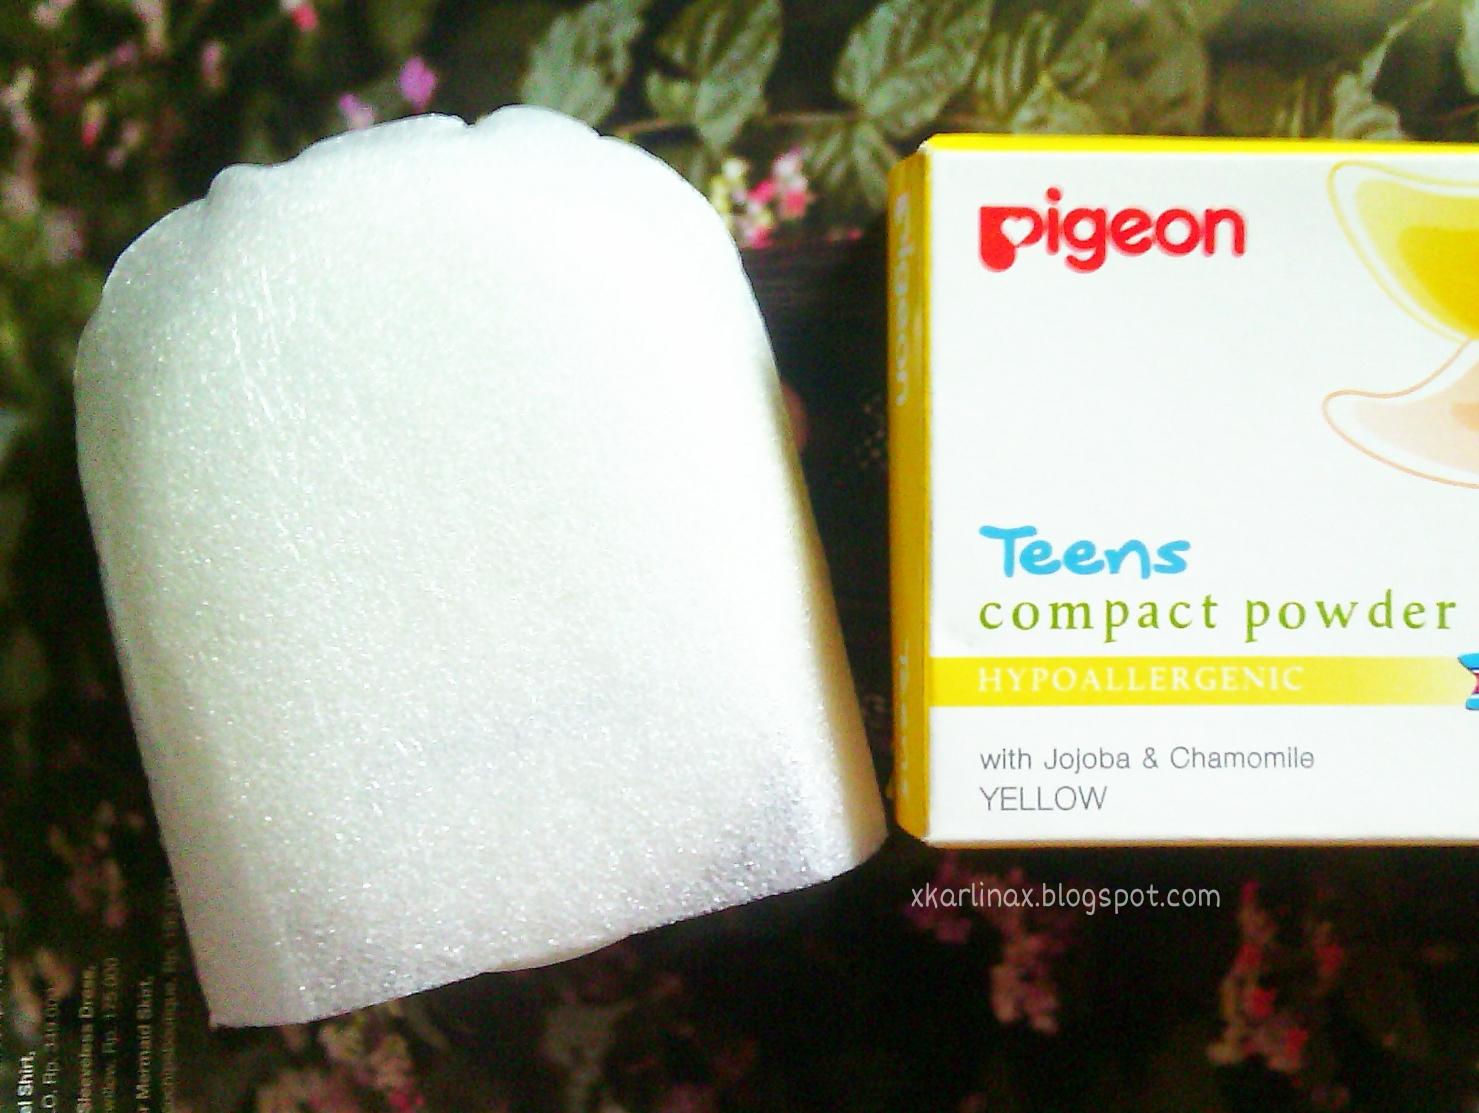 Beauty Pigeon Teens Compact Powder Hypoallergenic Daretochange Refill 20 Gr Gold 14g